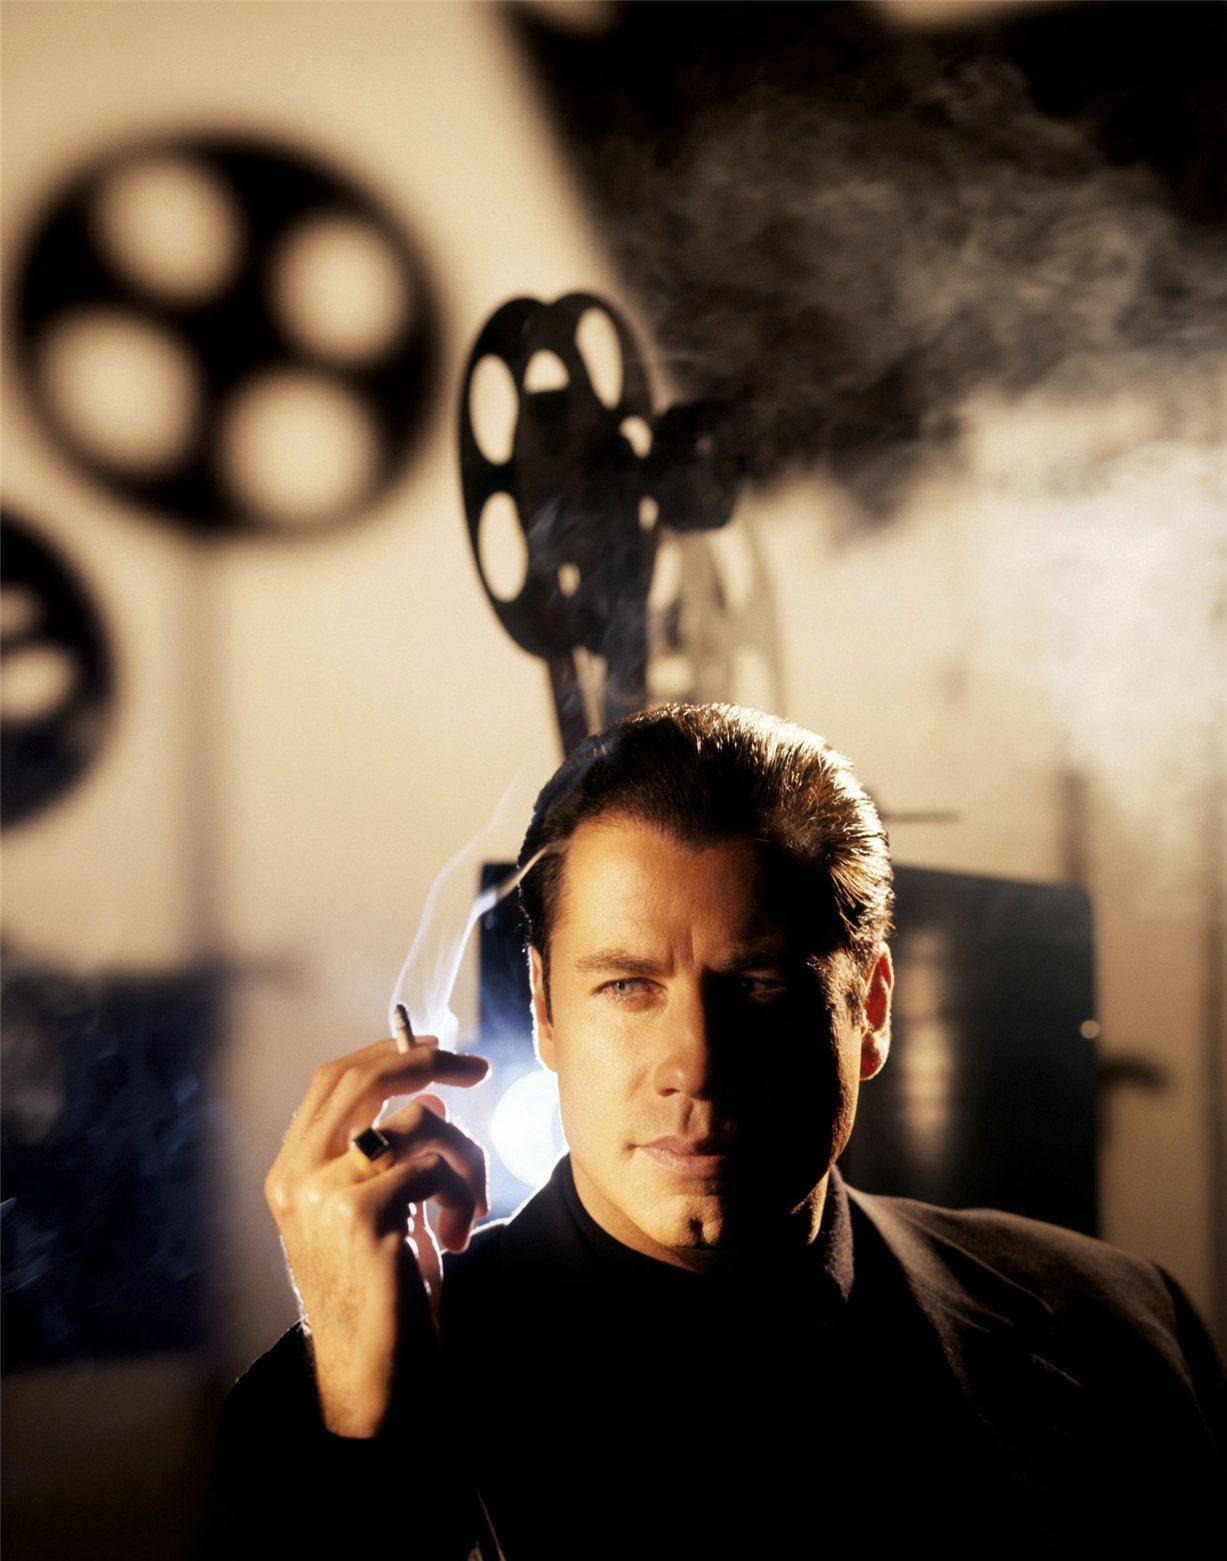 John Travolta / Джон Траволта - звезды Голливуда, фотограф Firooz Zahedi